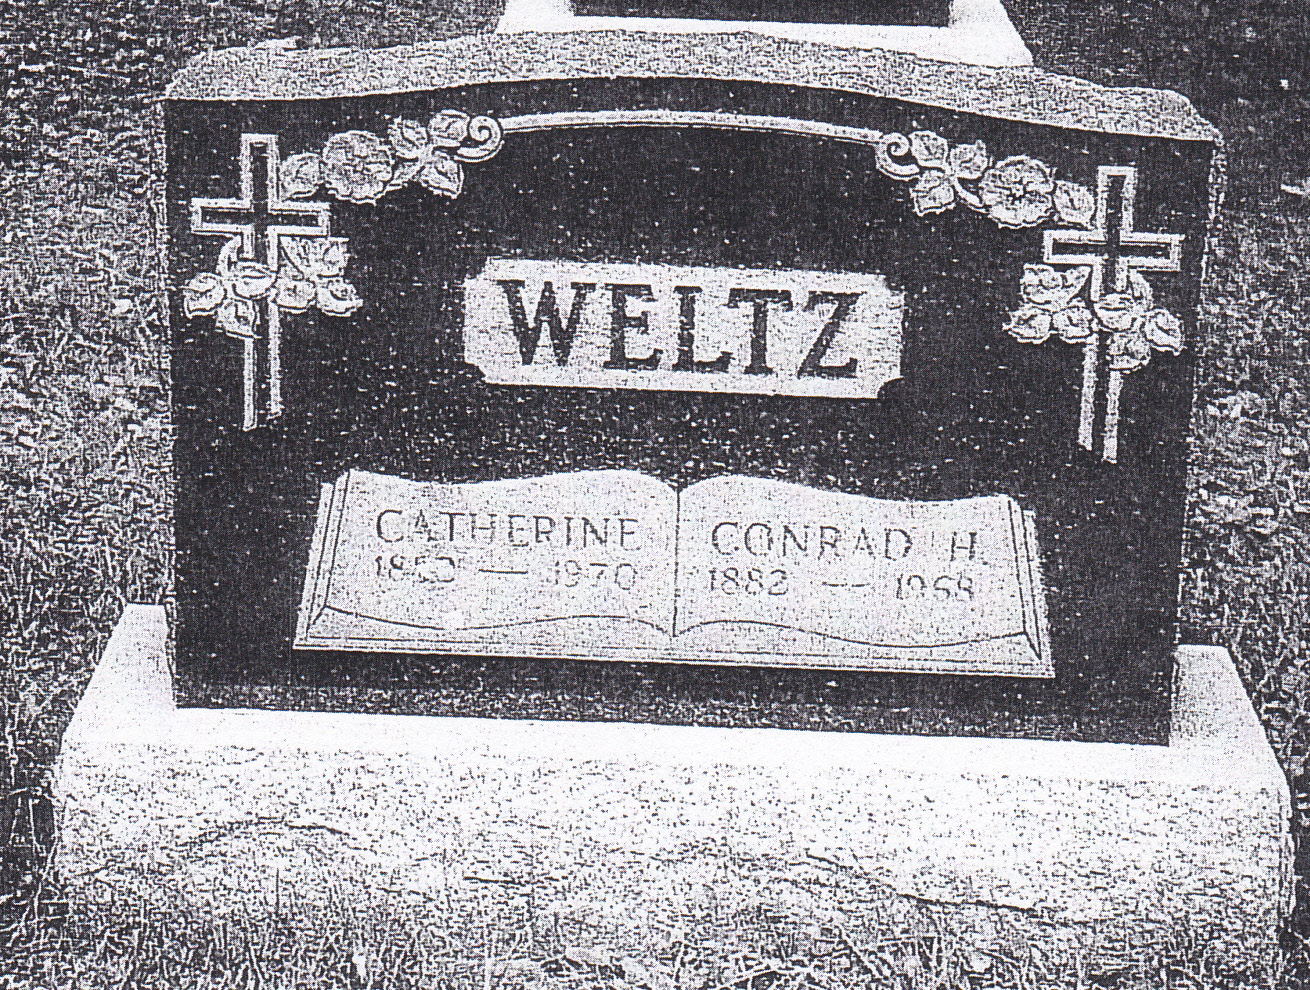 Henry Weltz